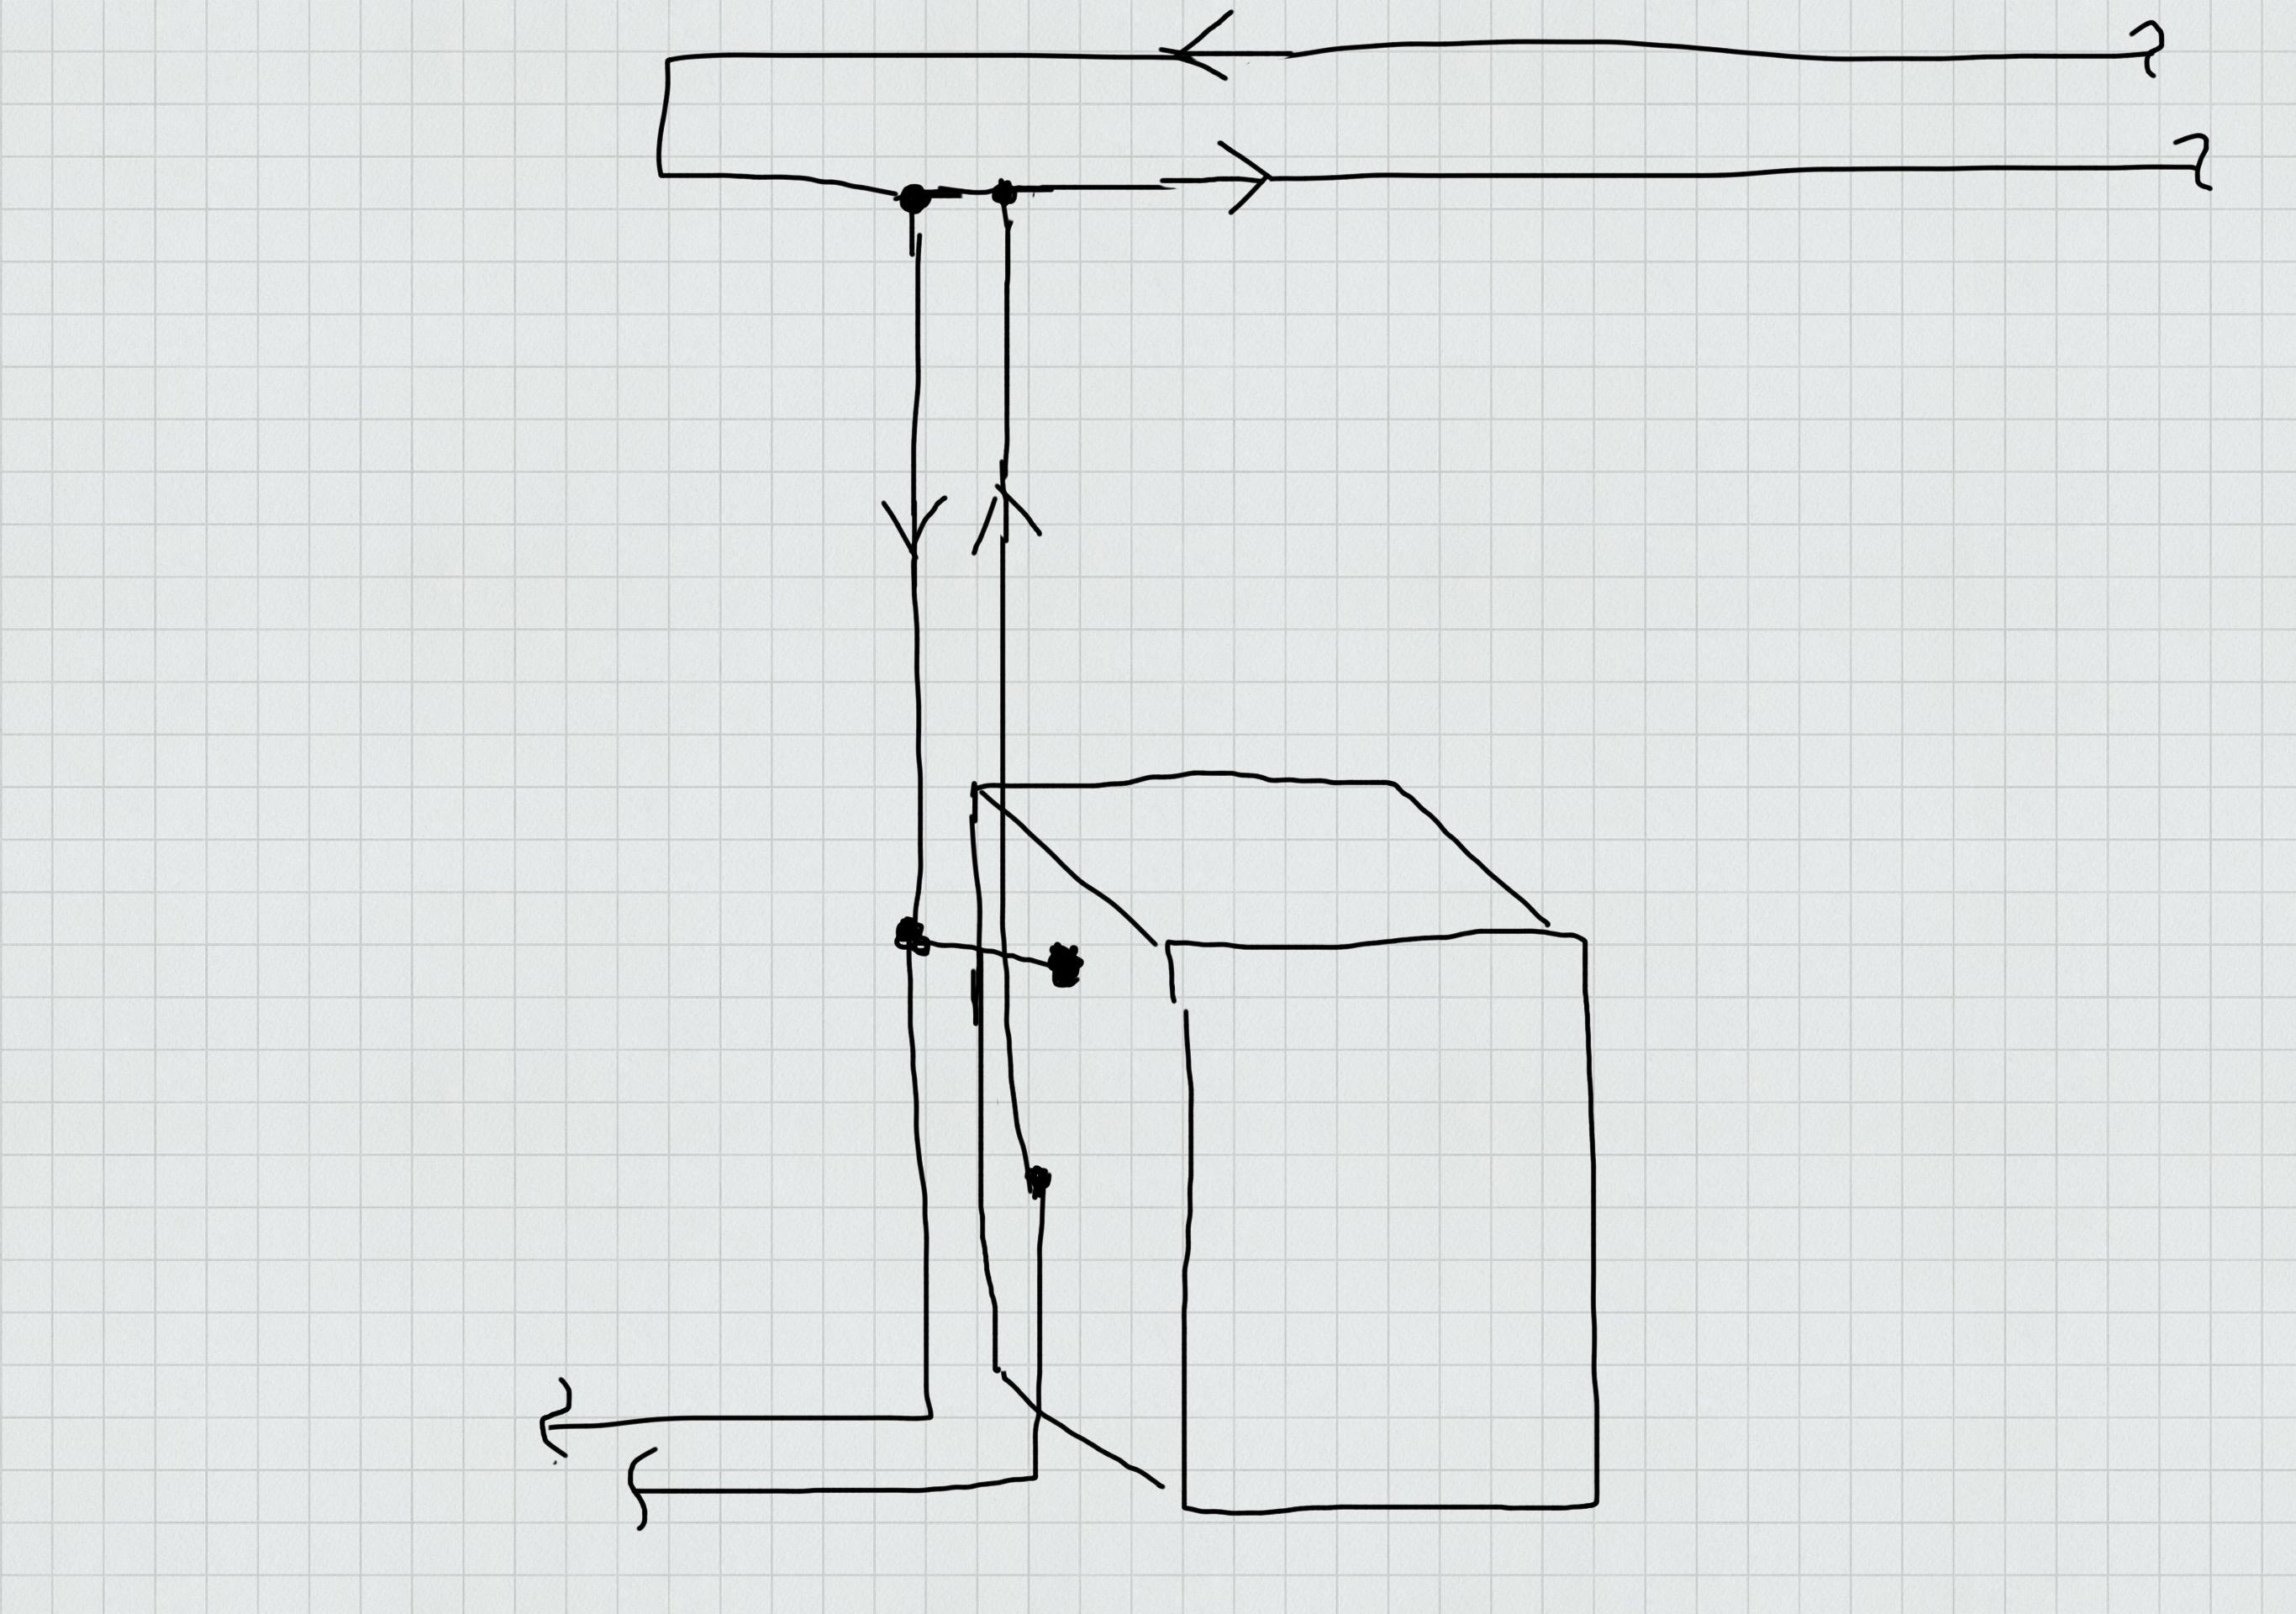 Weil Mclain GV-5 Baseboard Flow — Heating Help: The Wall